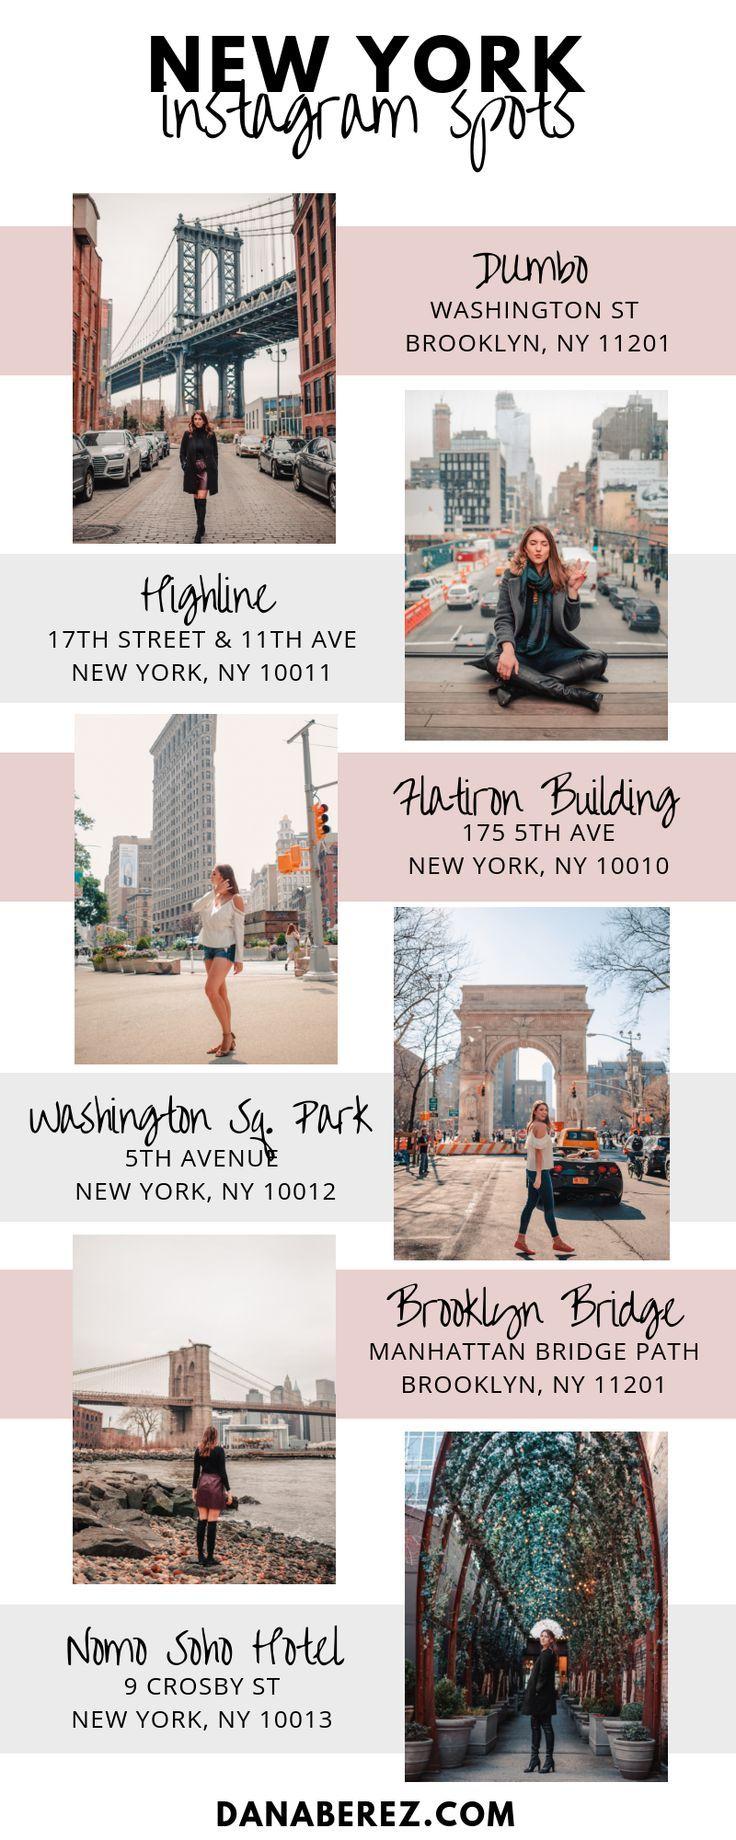 Die 10 besten Instagram-Spots in NYC – NYC Die meisten Instagram-fähigen Dana Berez